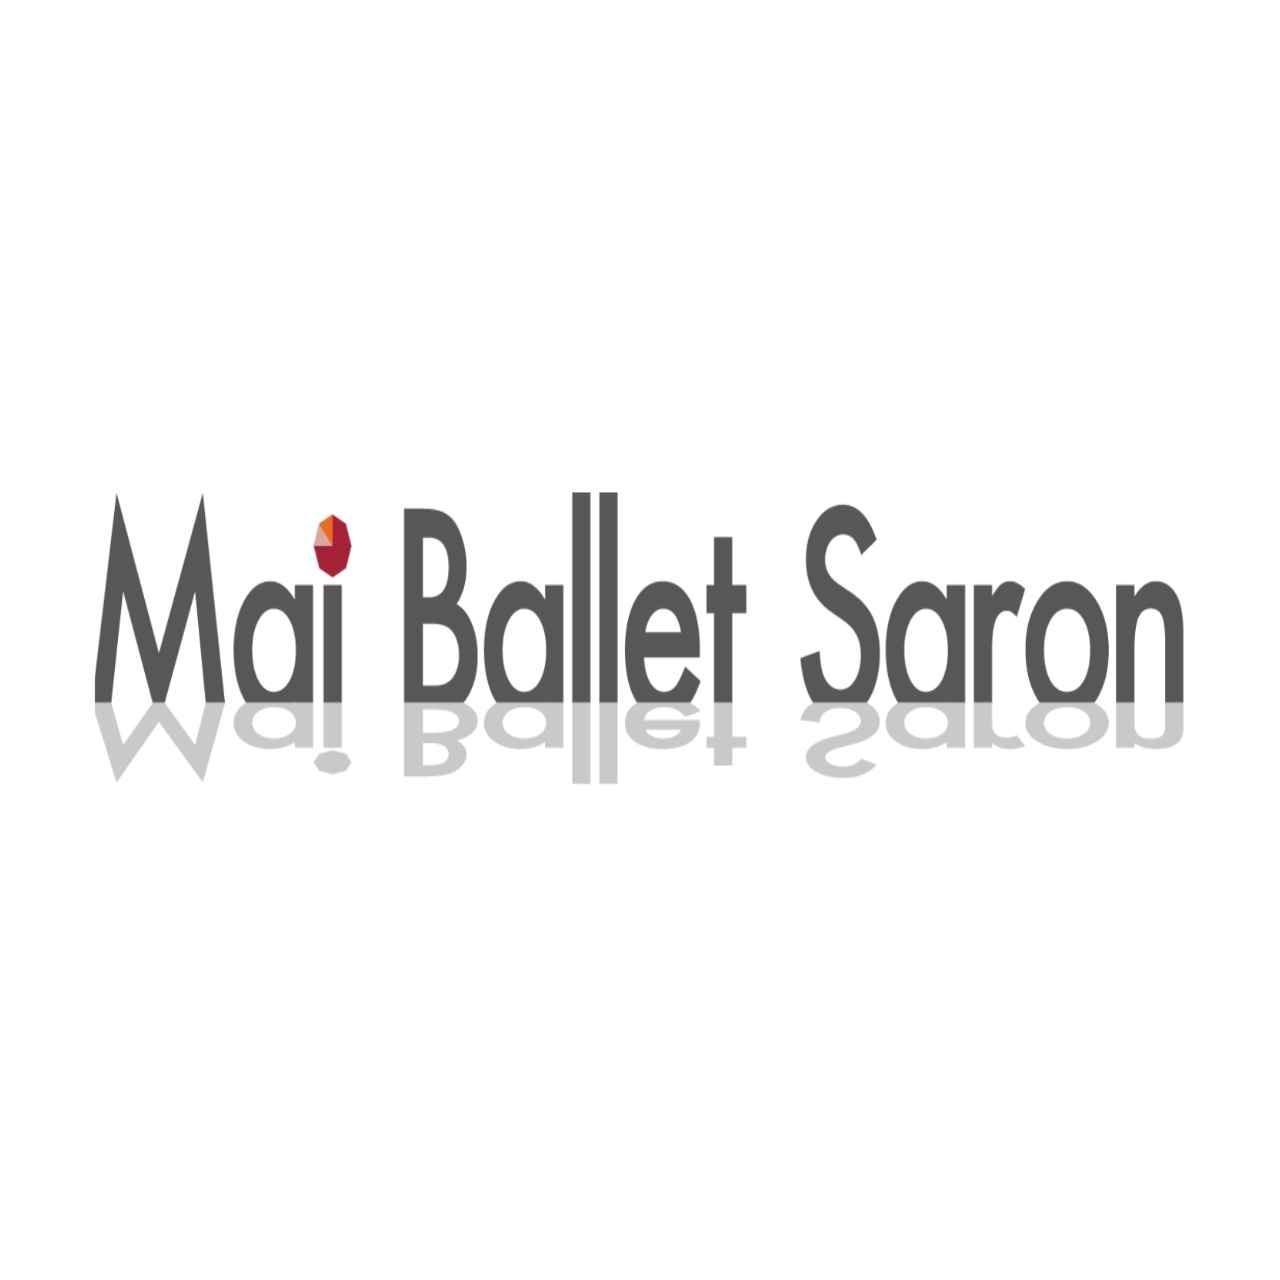 Mai Ballet Salon